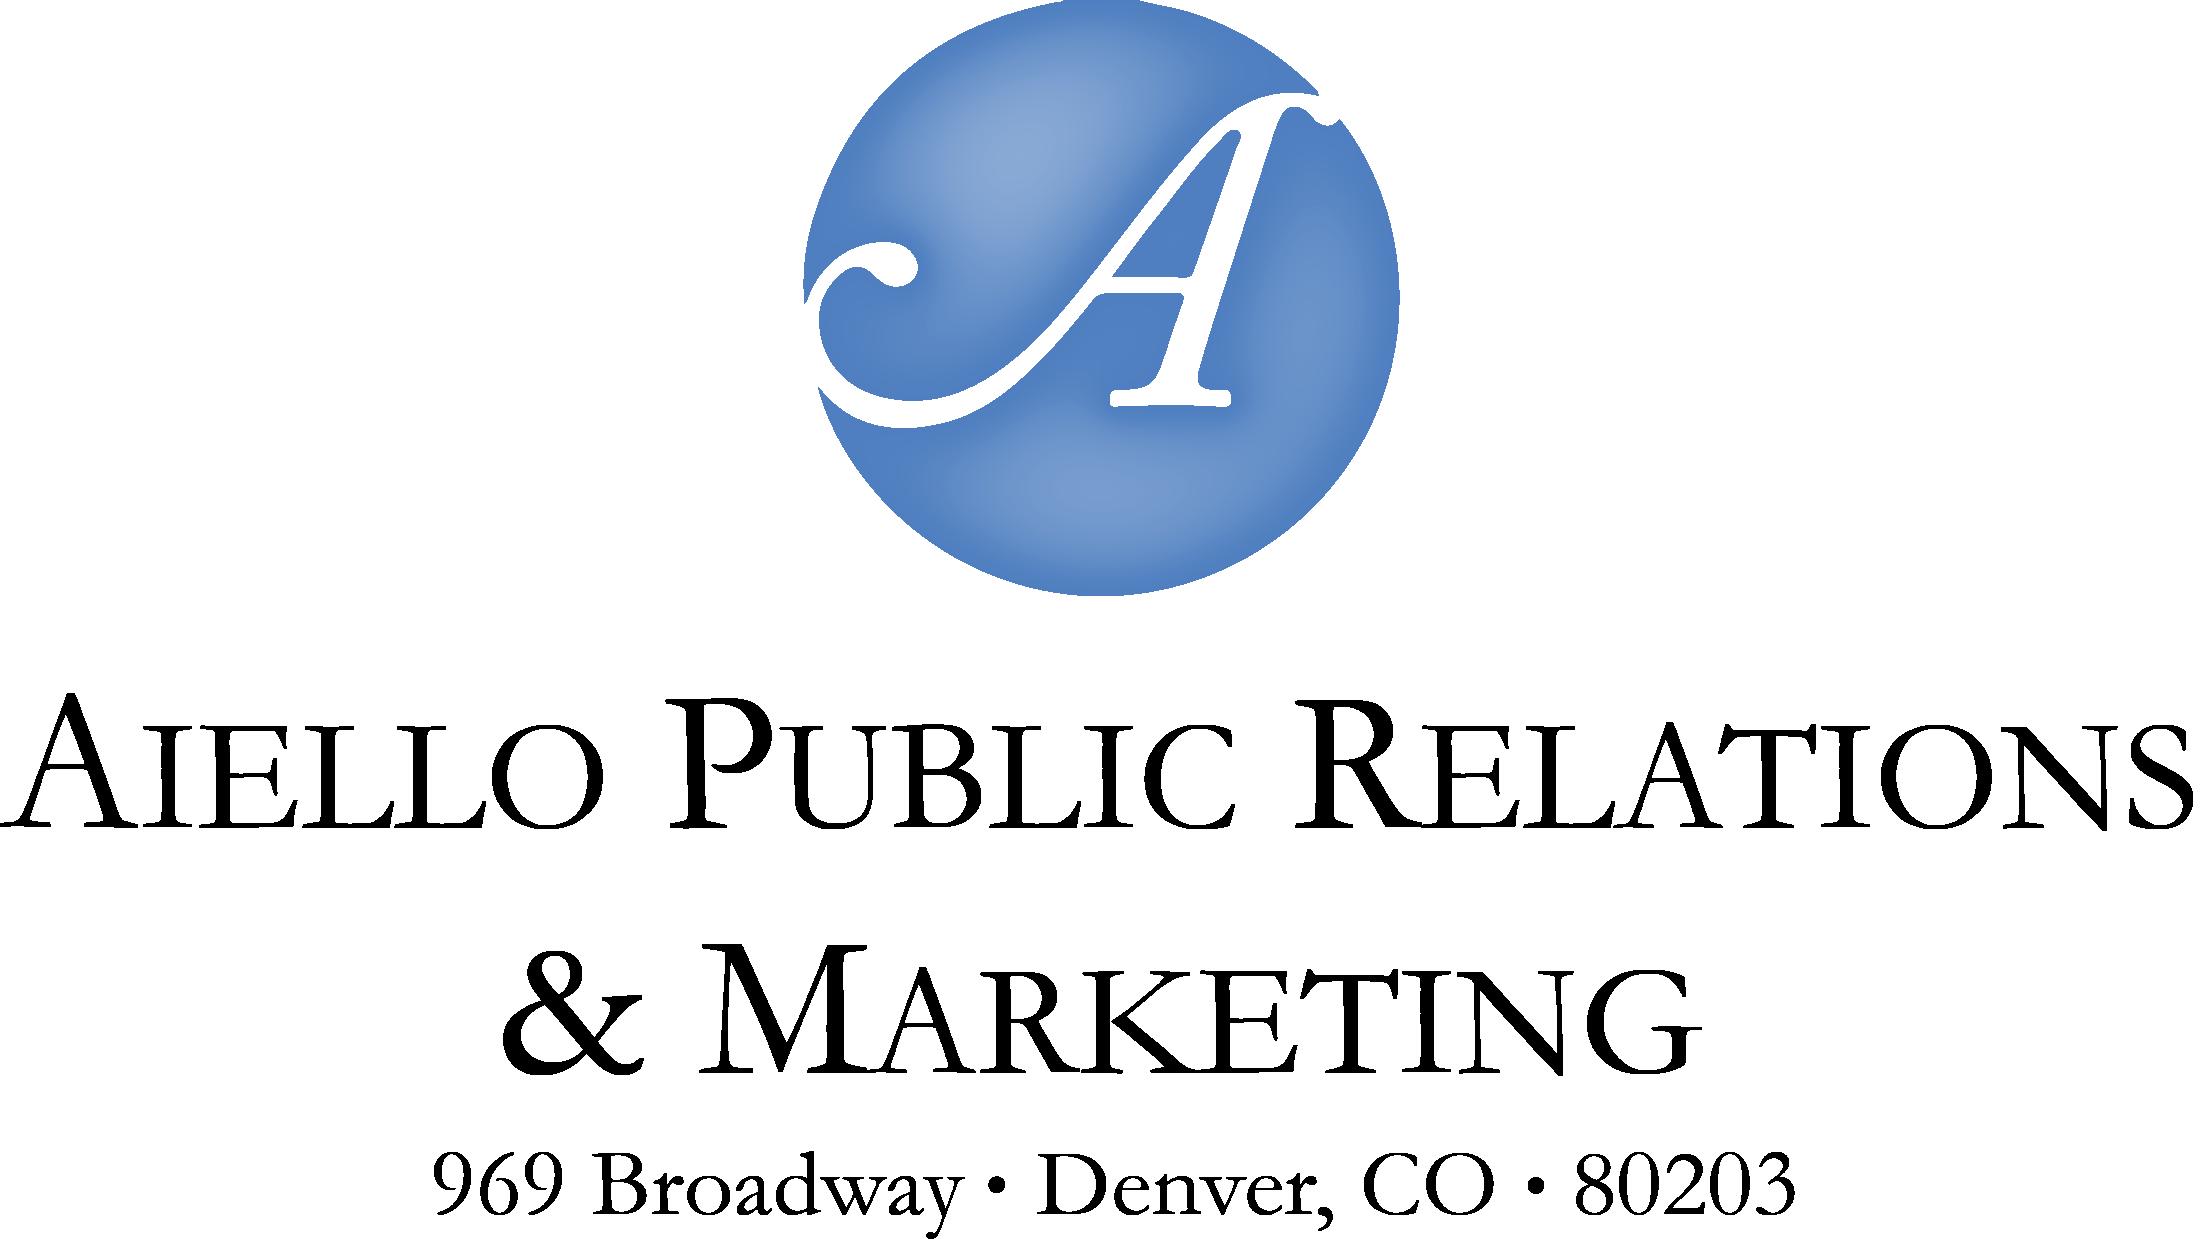 AielloLogo.Letterhead(GaramondFont)